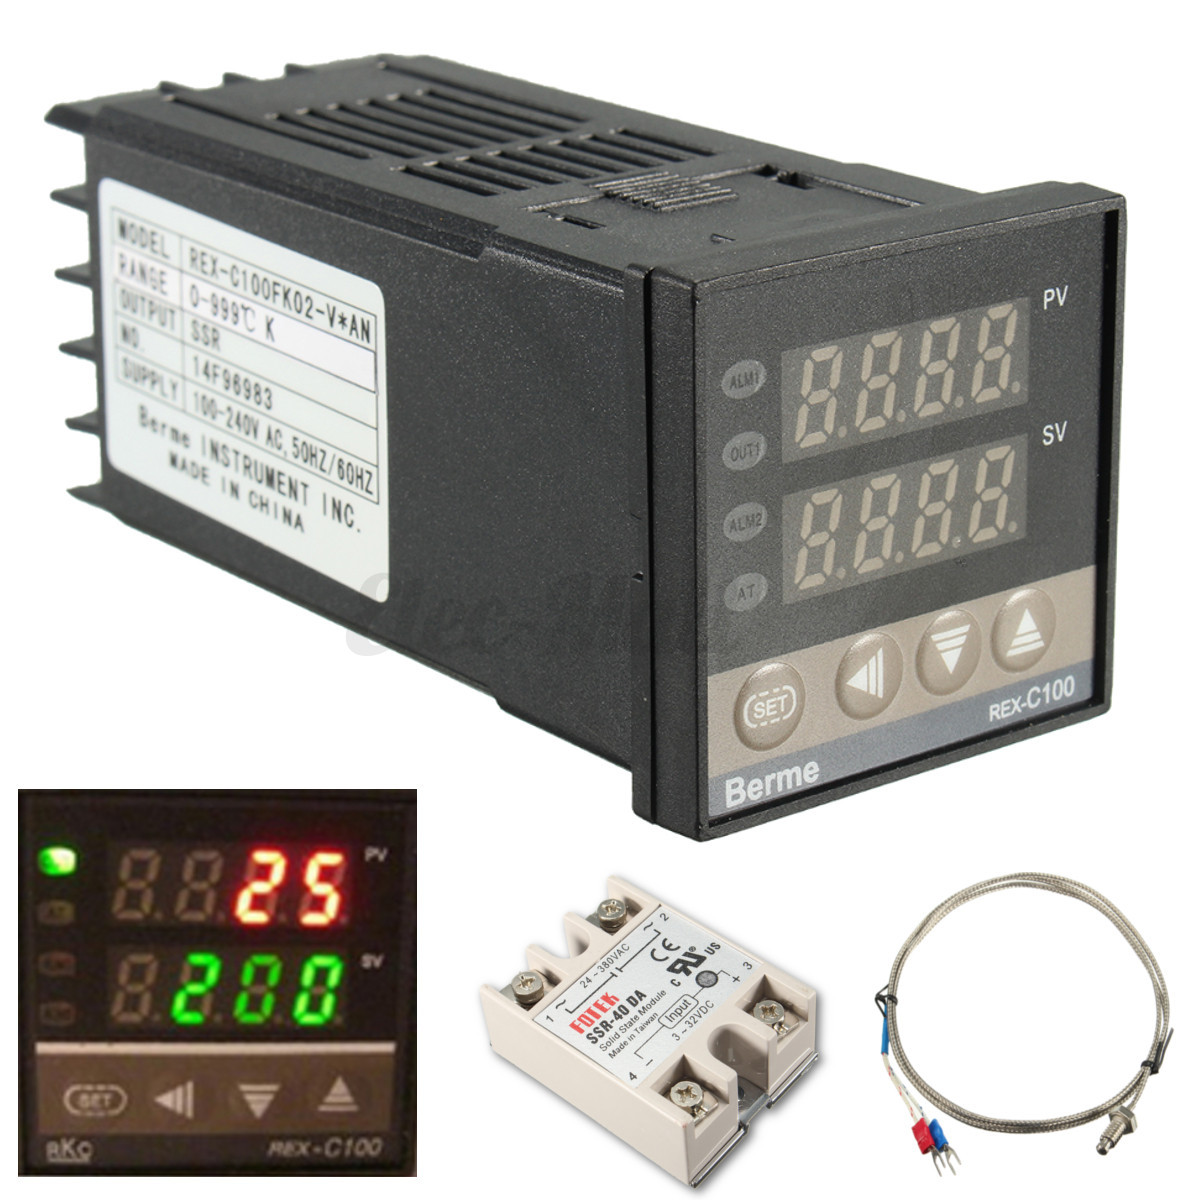 PID REX C100 Temperature Controller   40A SSR   K Thermocouple eBay #28B516